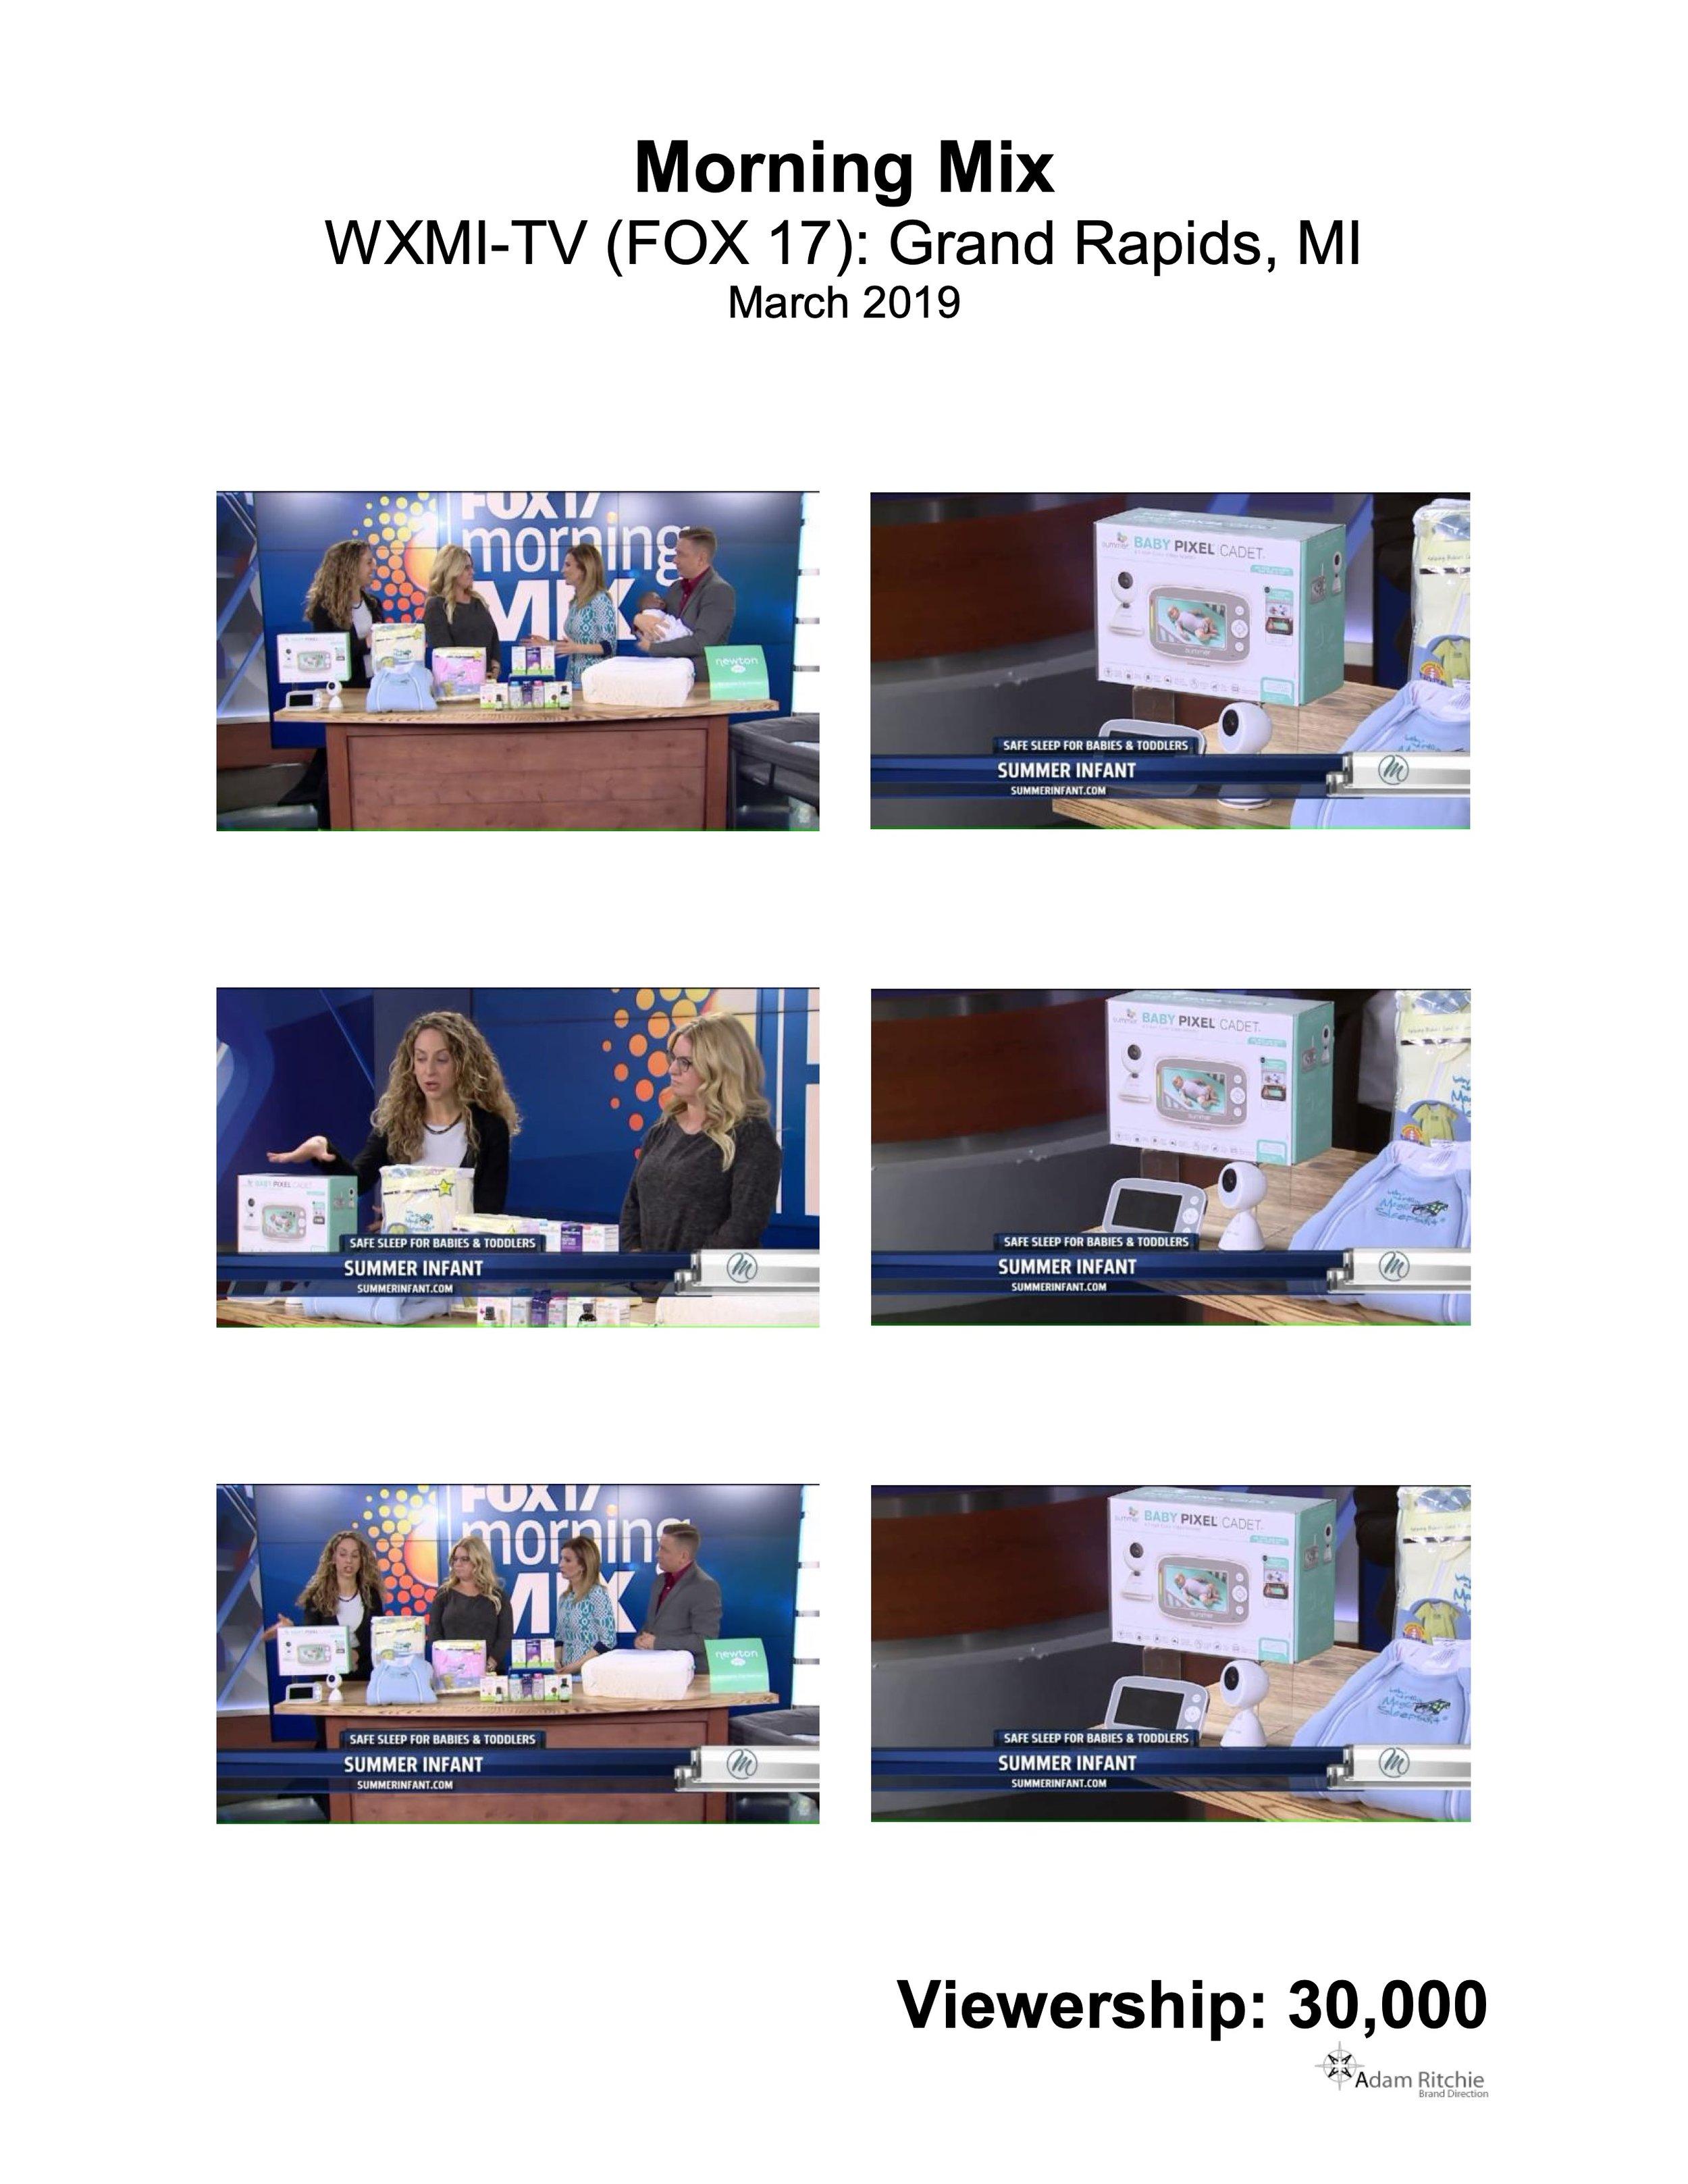 2019.03.01_WXMI-TV (FOX 17) Grand Rapids, MI Morning Mix_Summer Baby Pixel Cadet Video Monitor.jpeg